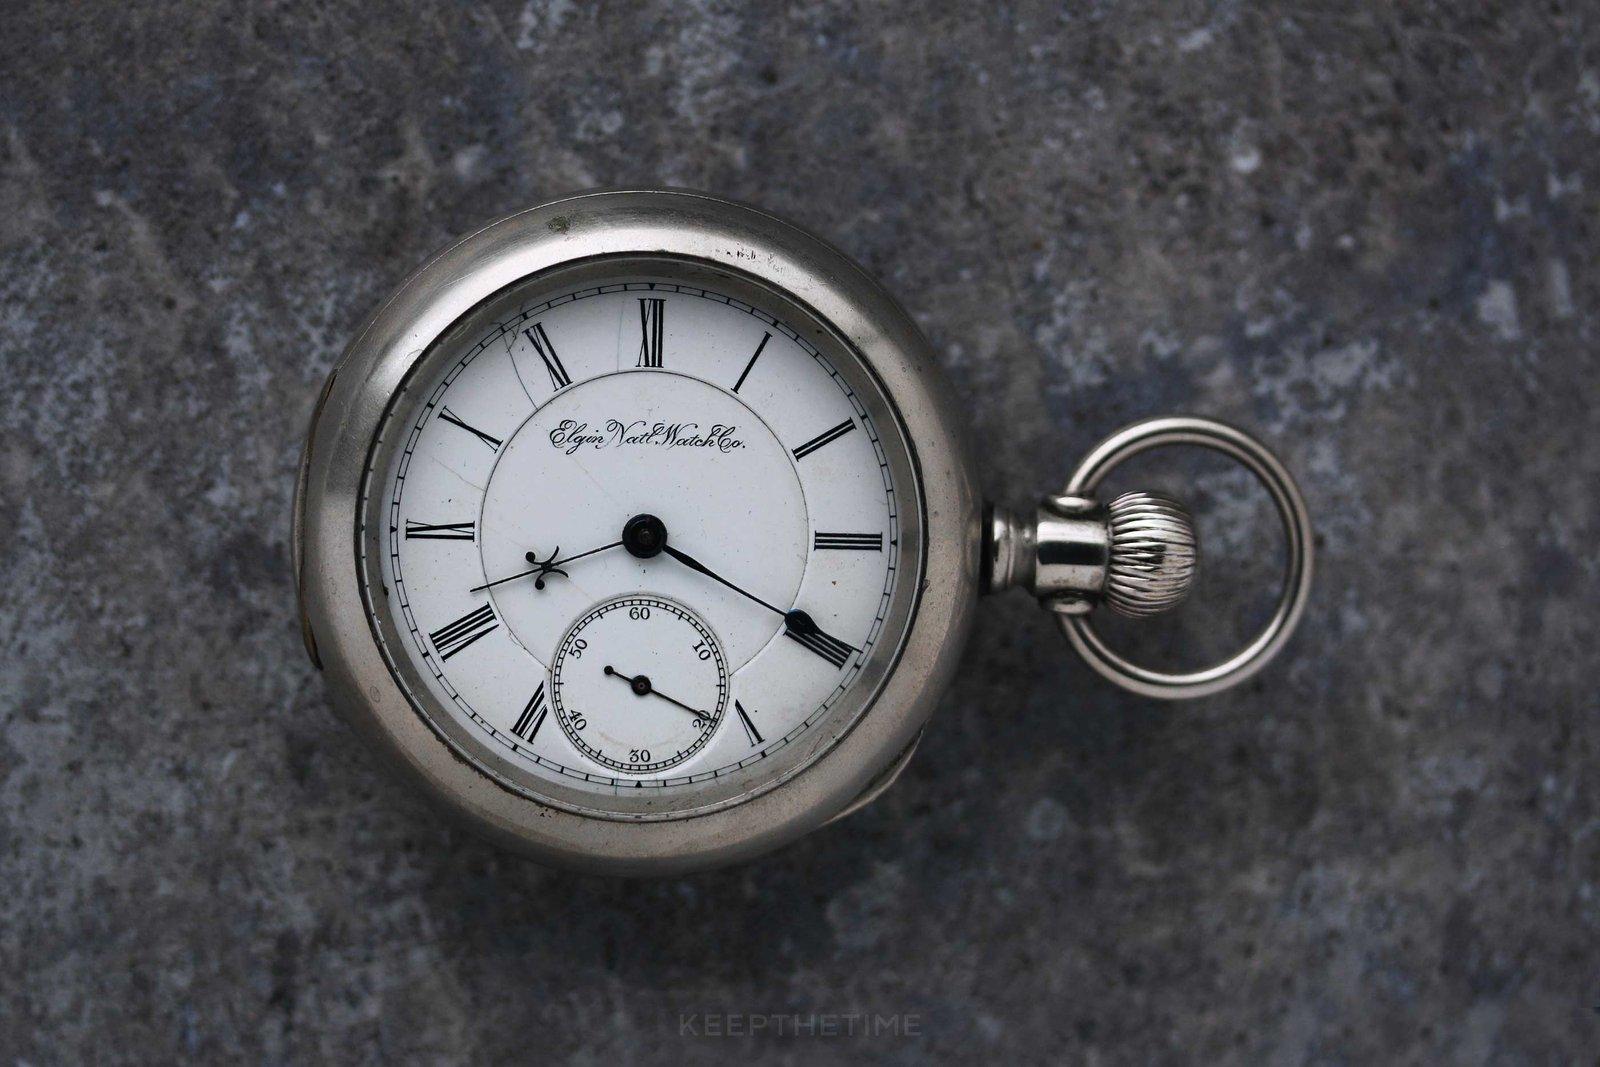 501805497 Vintage Elgin B.W. Raymond Pocket Watch from 1890